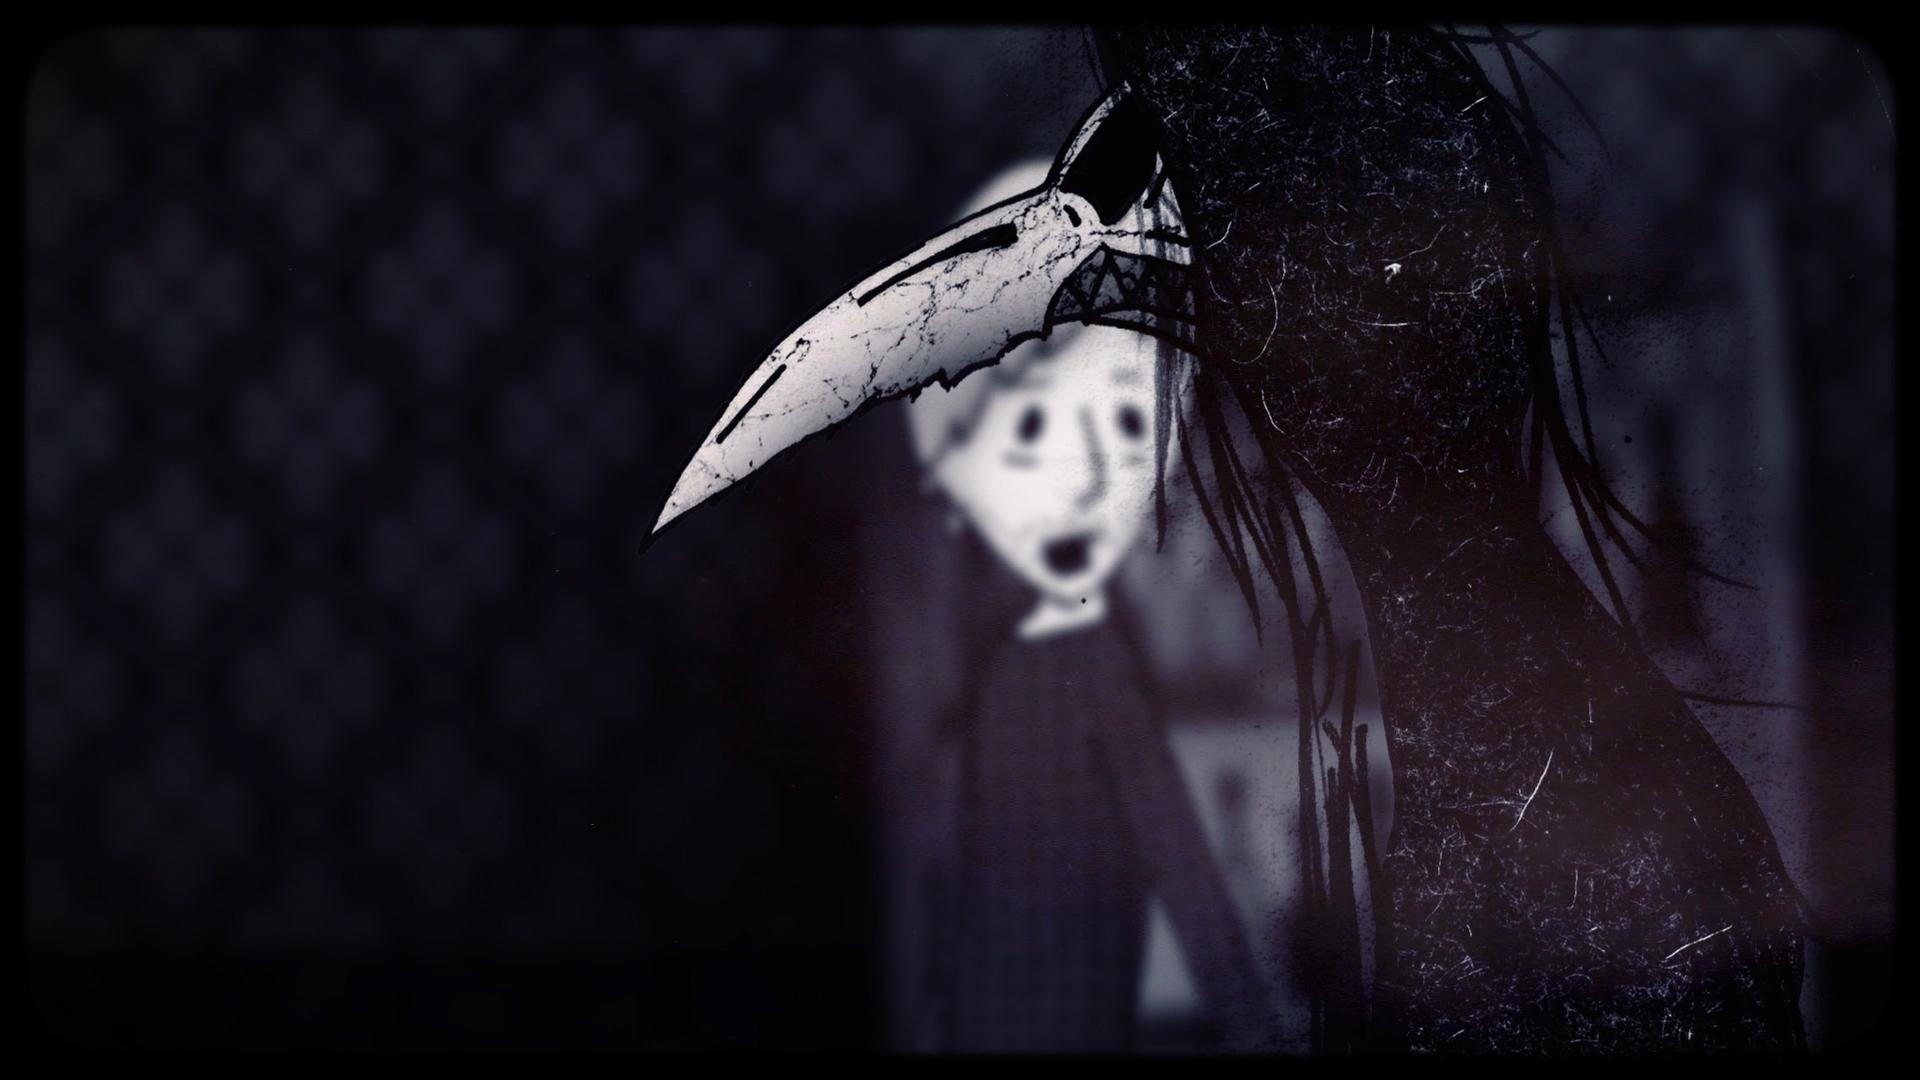 Edgar Allan Poe: From Love to Death